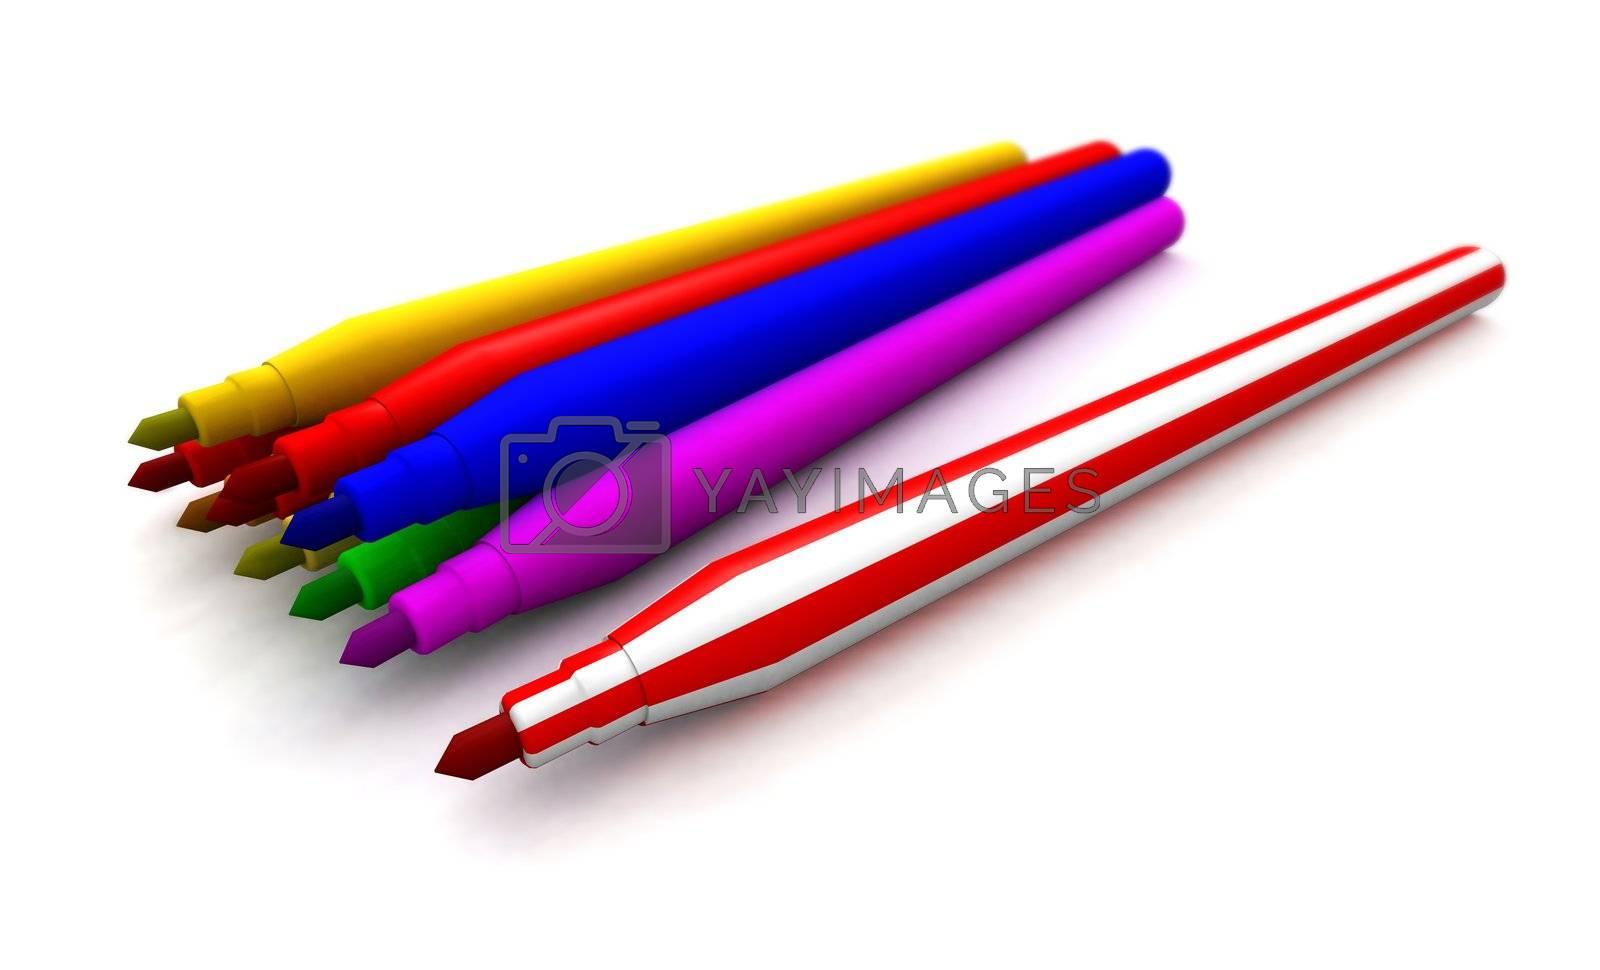 a 3d rendering of some felt tip pens